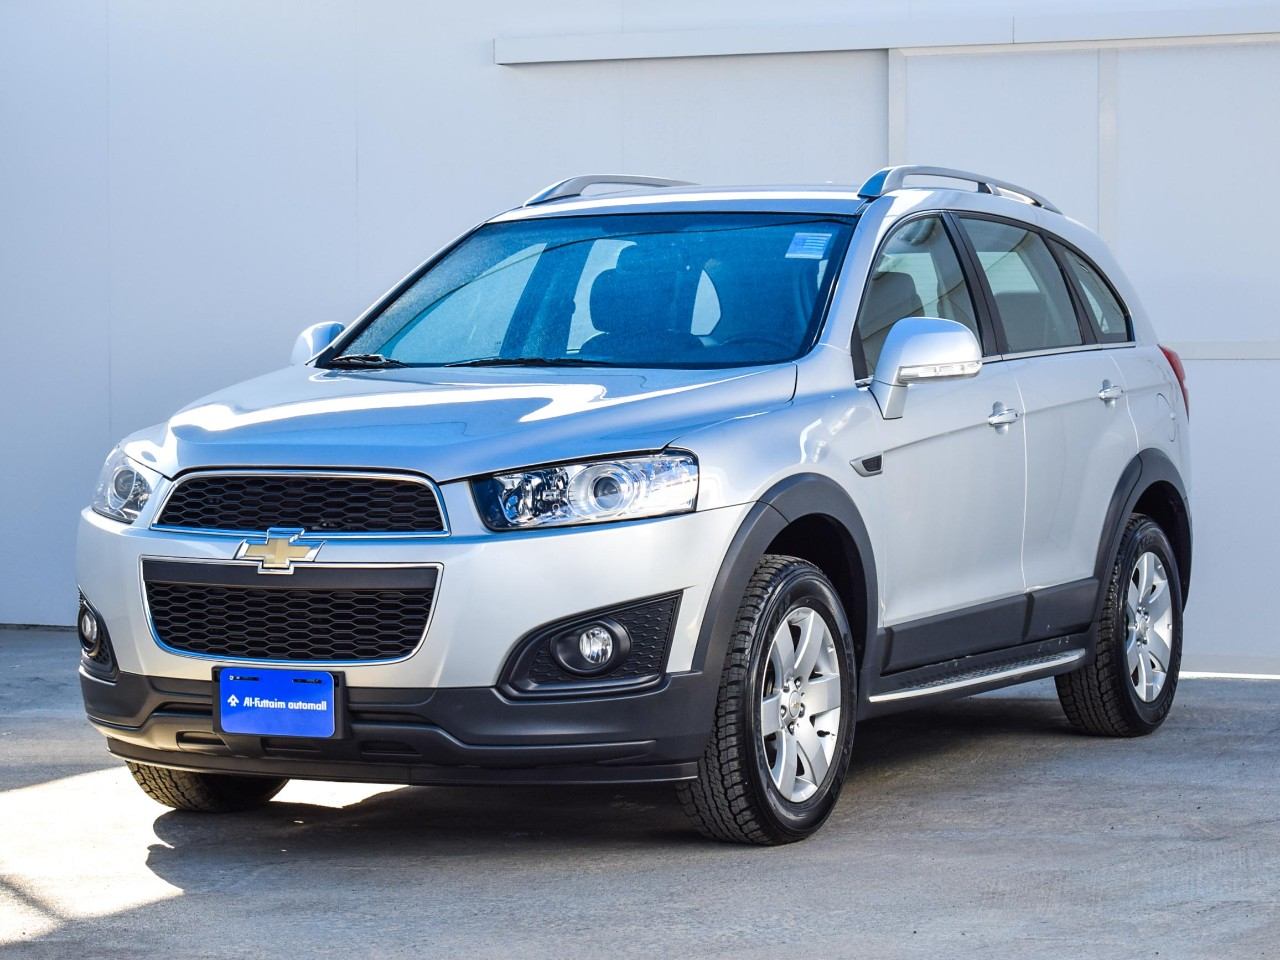 Kelebihan Chevrolet Captiva 2015 Harga